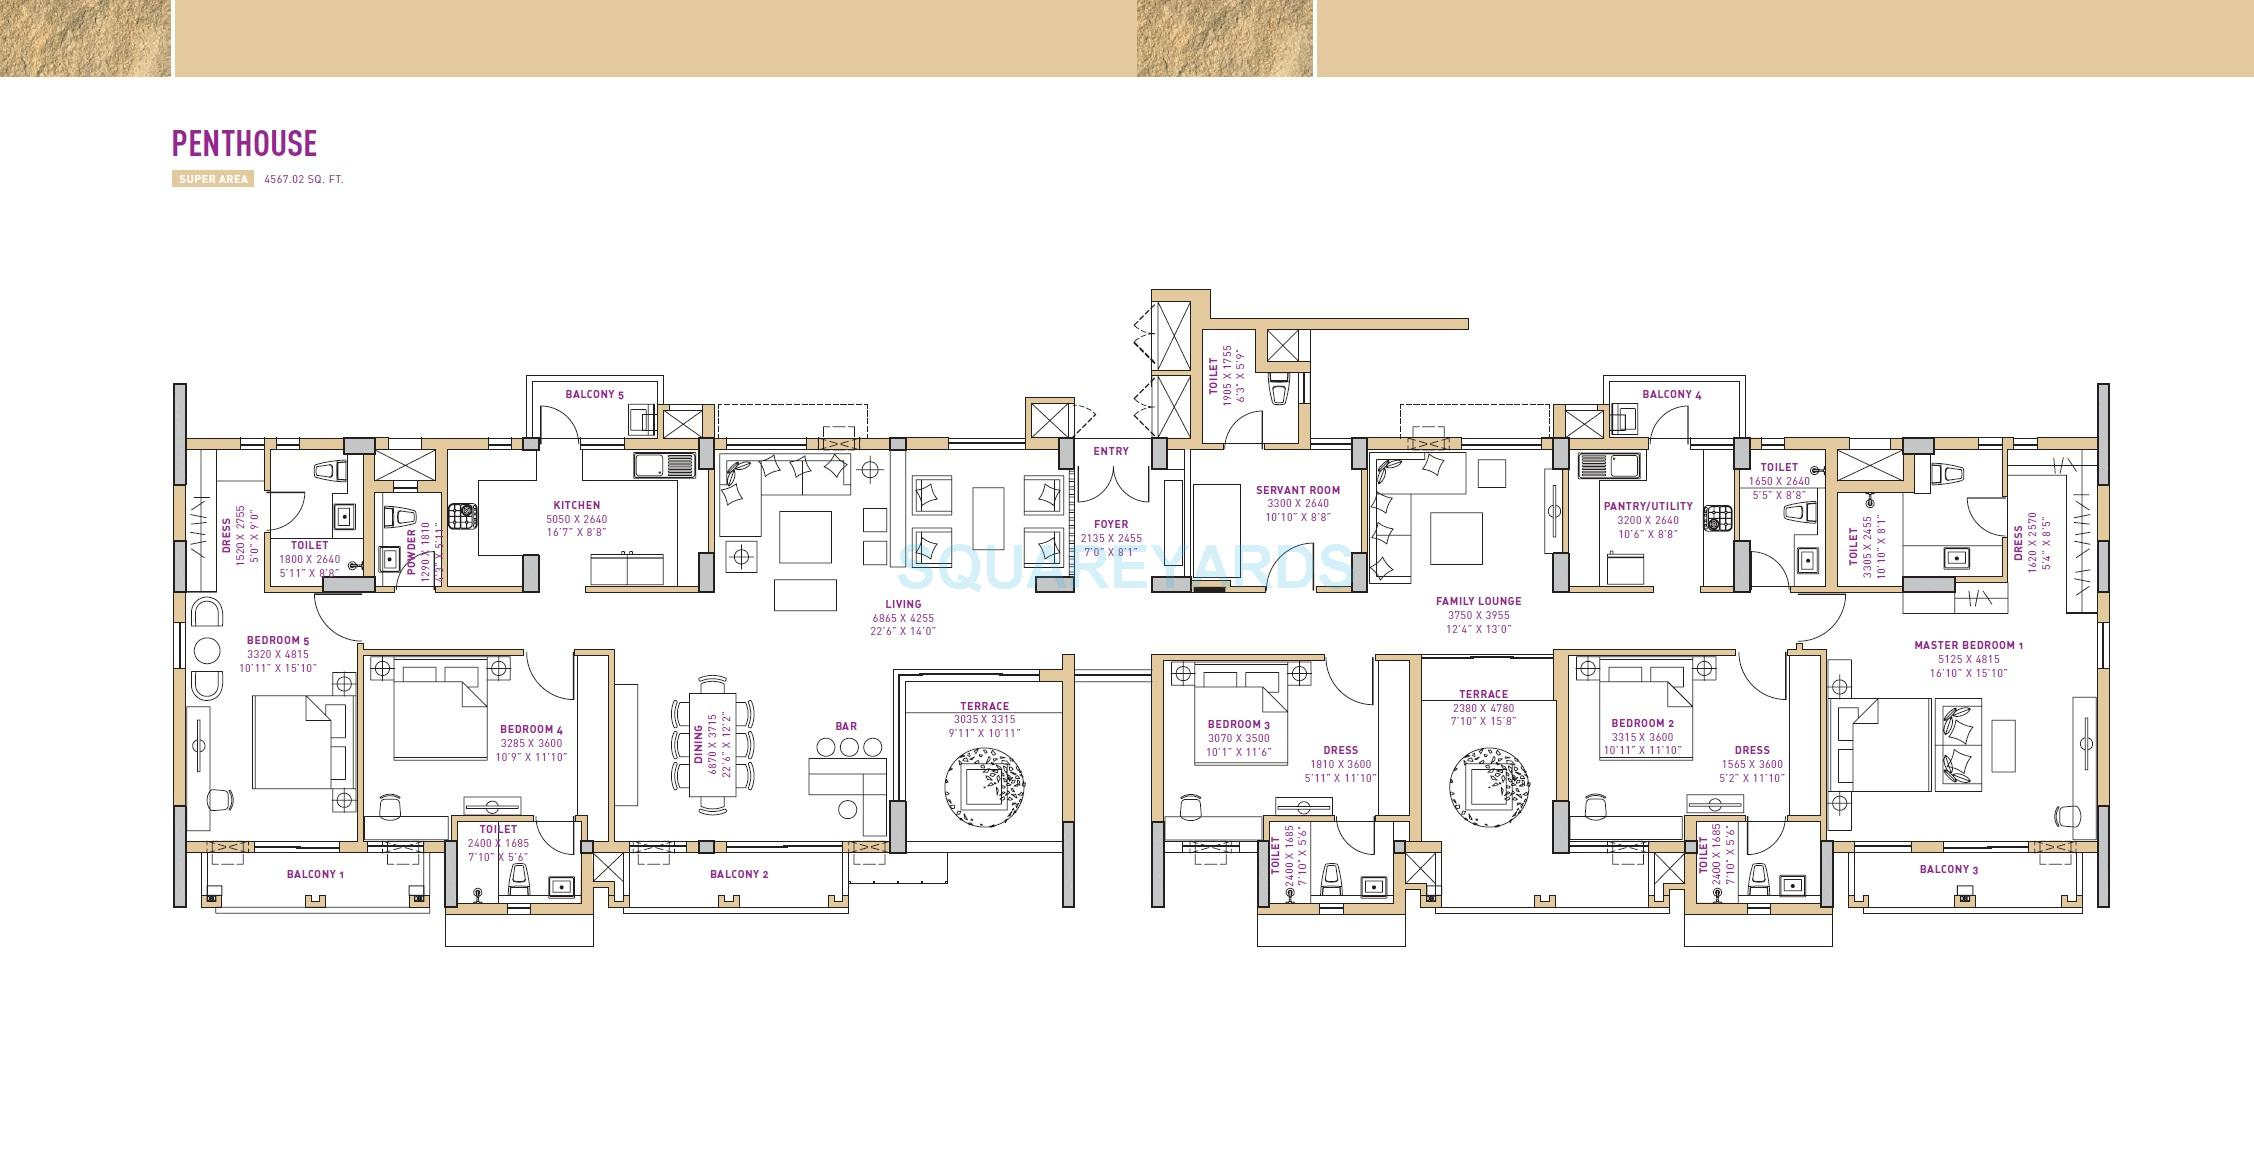 vatika seven lamps penthouse 5bhk 4567 02sqft 1